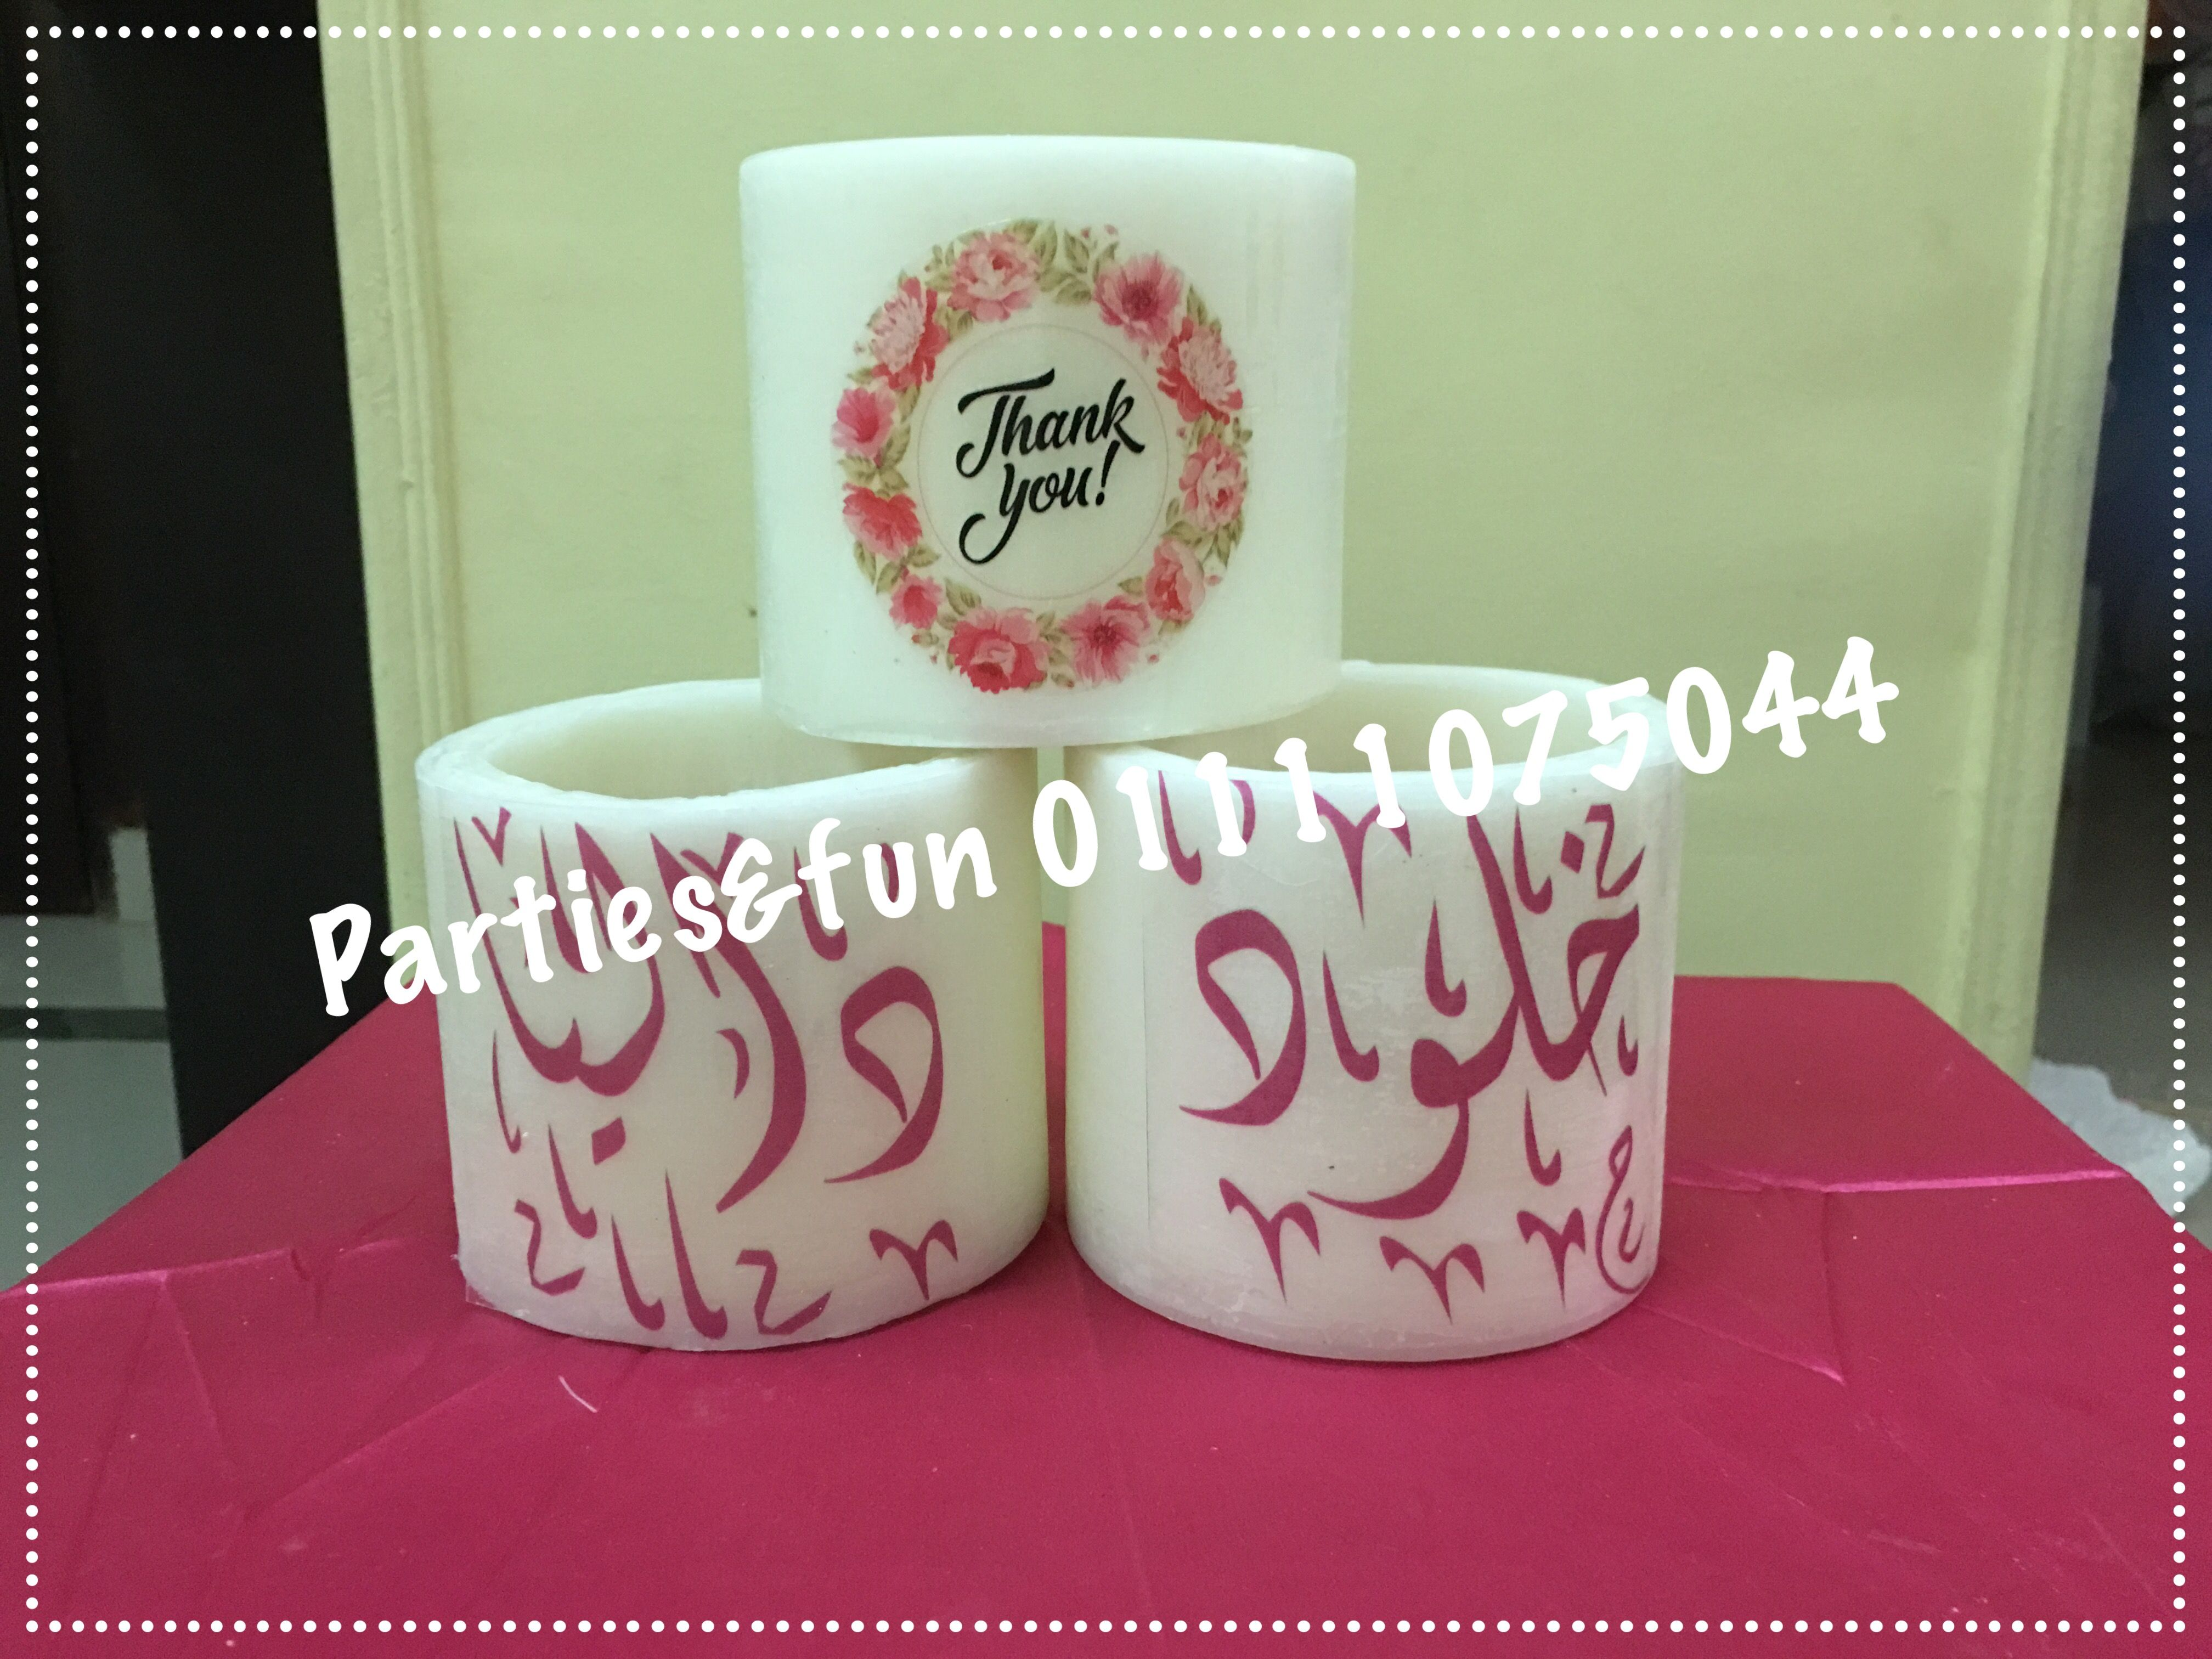 Candles شموع هدايا عيد الام وهدايا للمدرسات Facebook Partiesandfunegypt Mobile 01111075044 Glassware Tableware Mugs